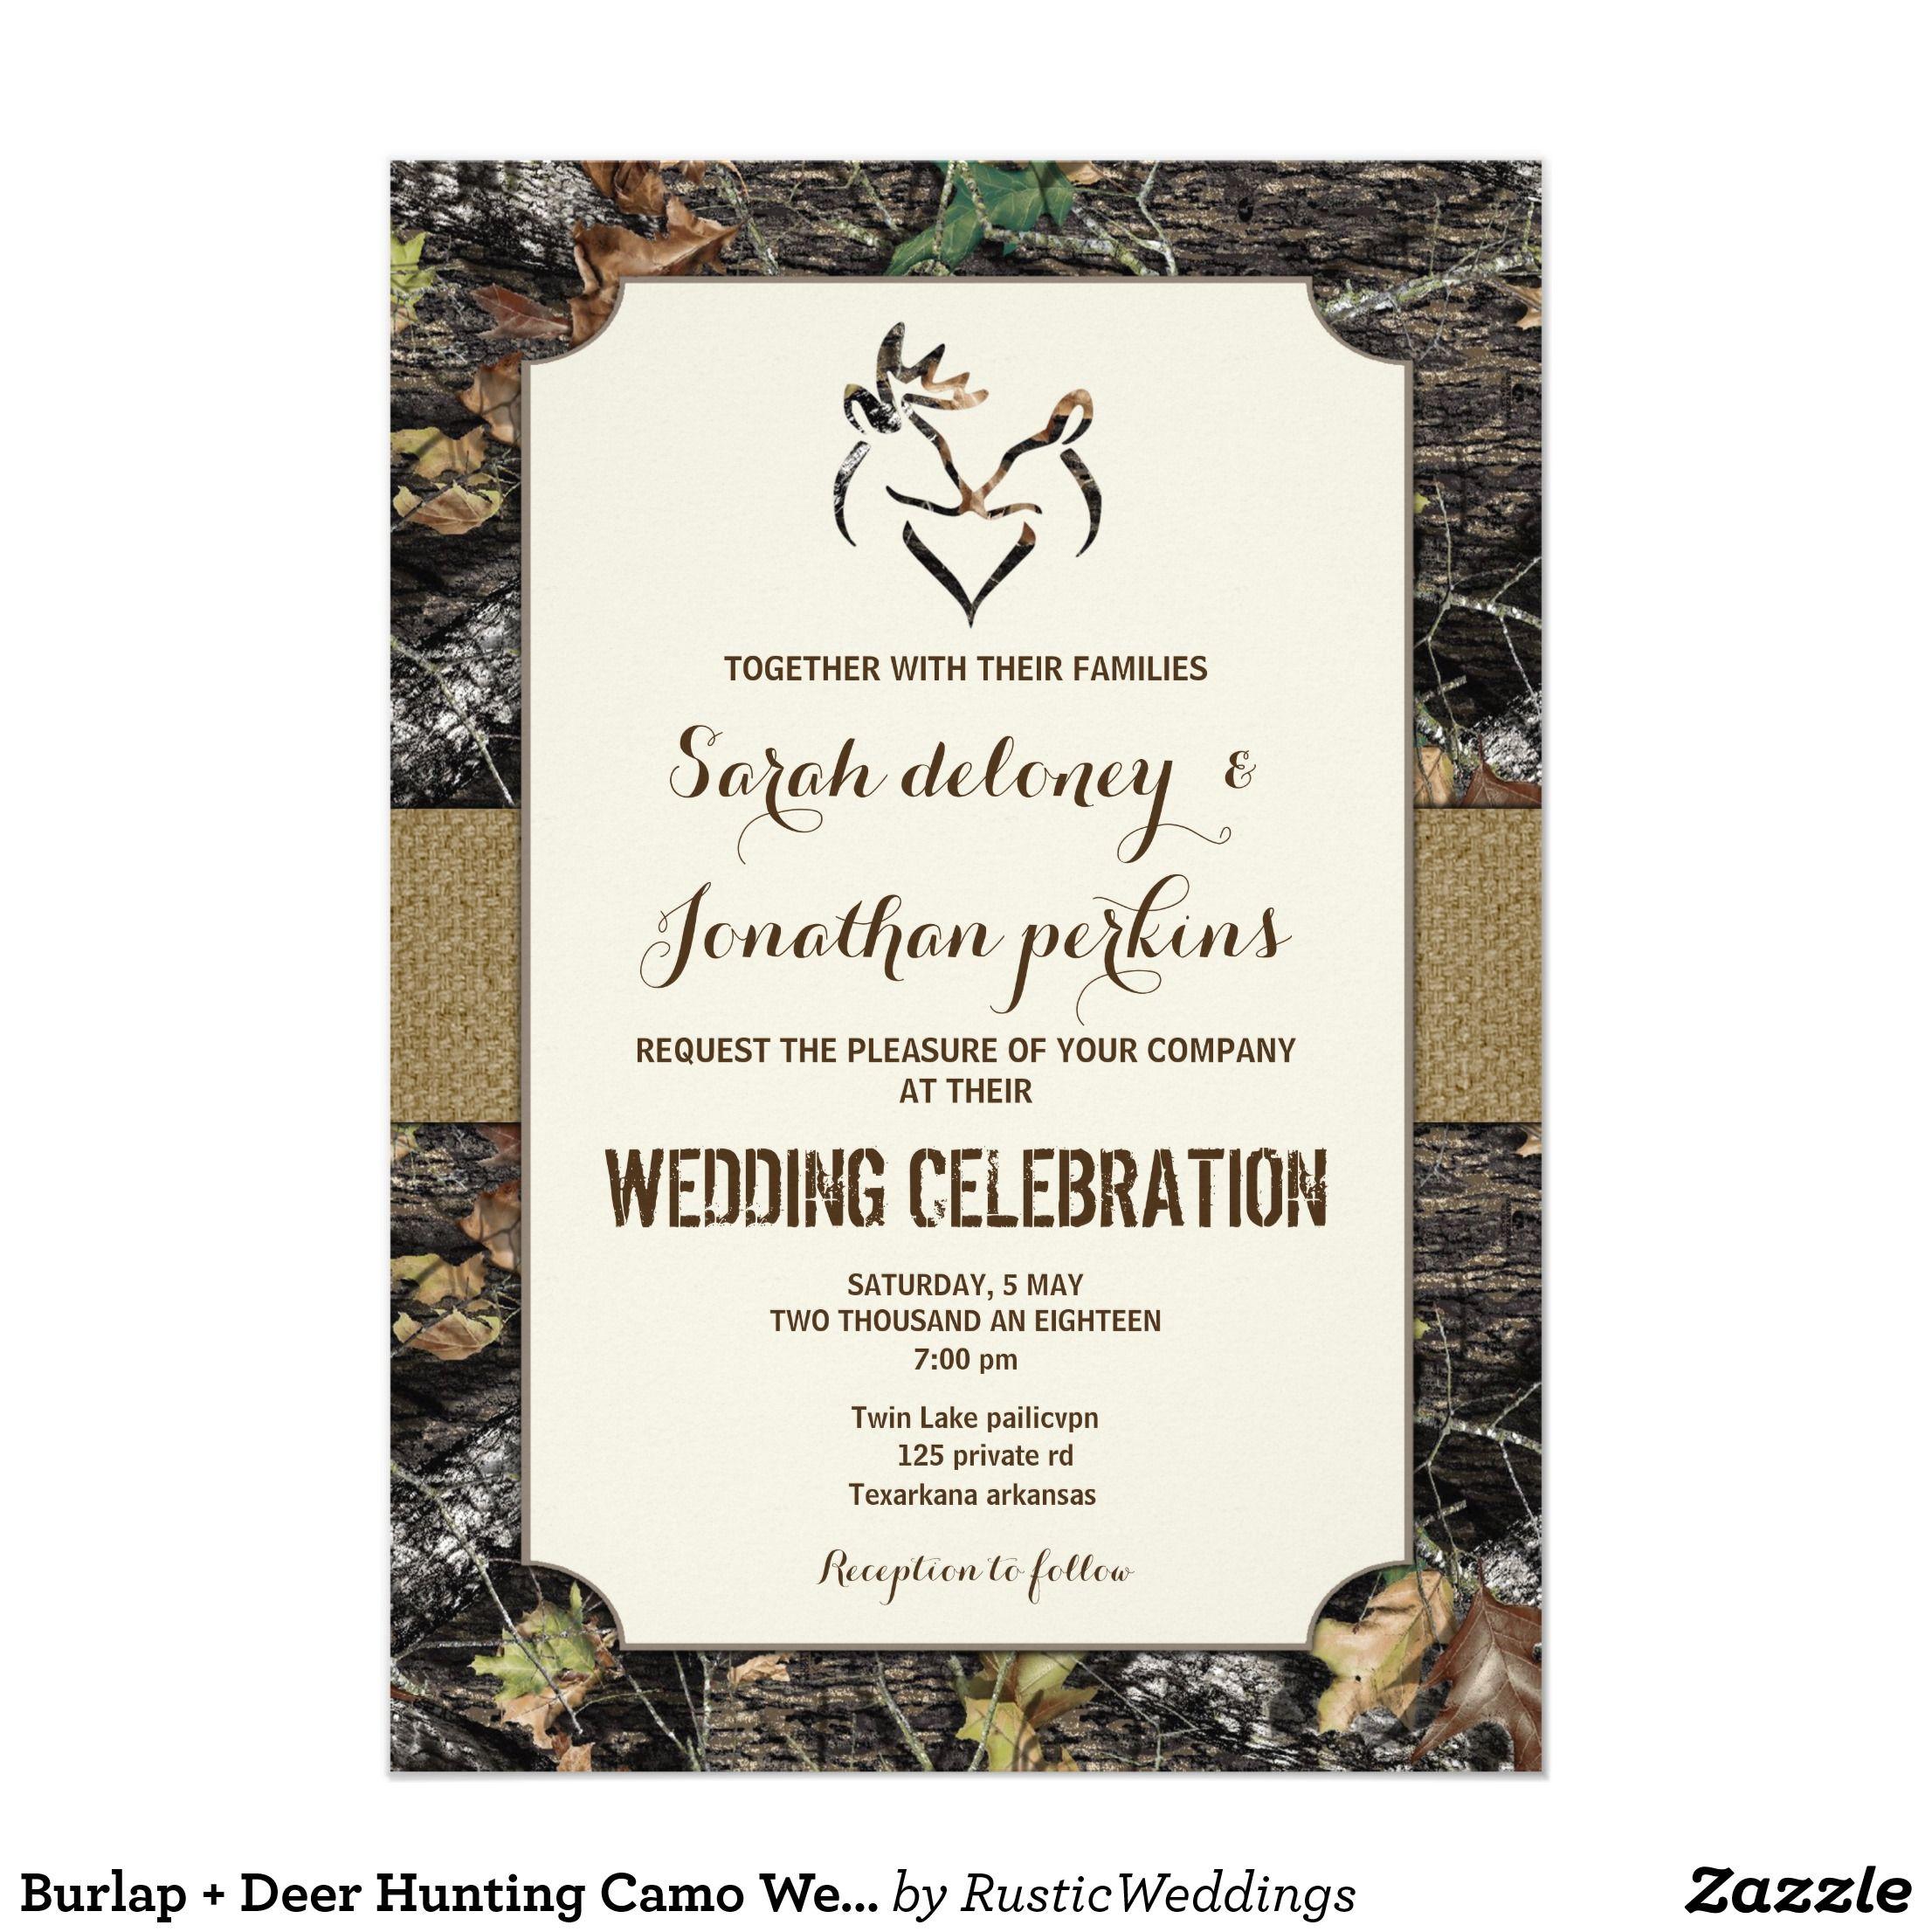 Burlap + Deer Hunting Camo Wedding Invitations | Wedding ideas ...